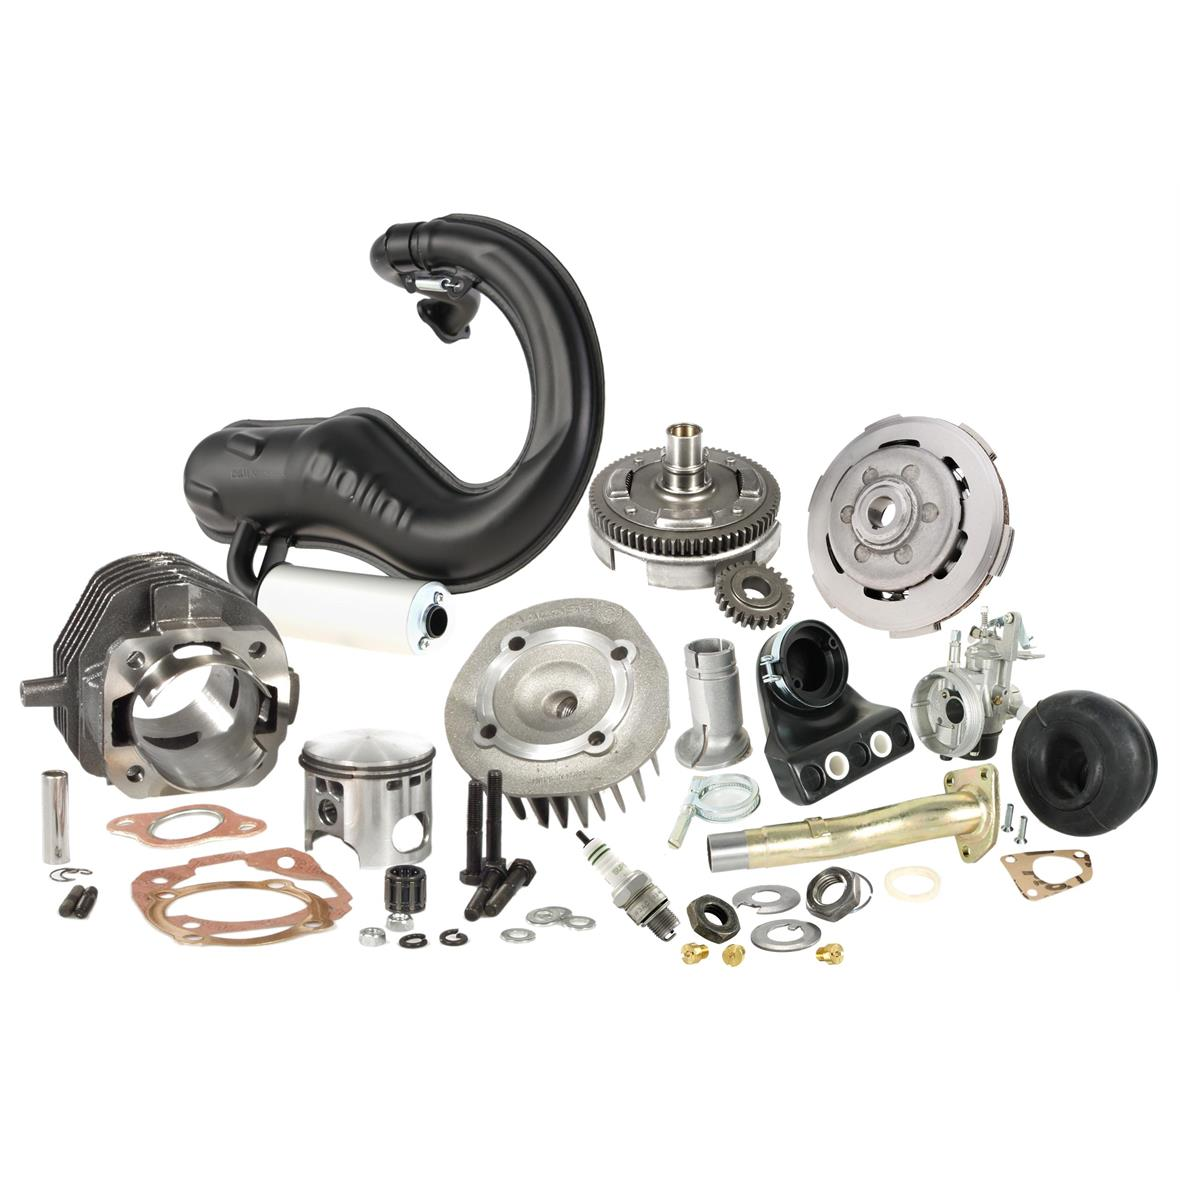 Produktbild für 'Tuningkit MALOSSI Sport 112 ccm 2-Loch'